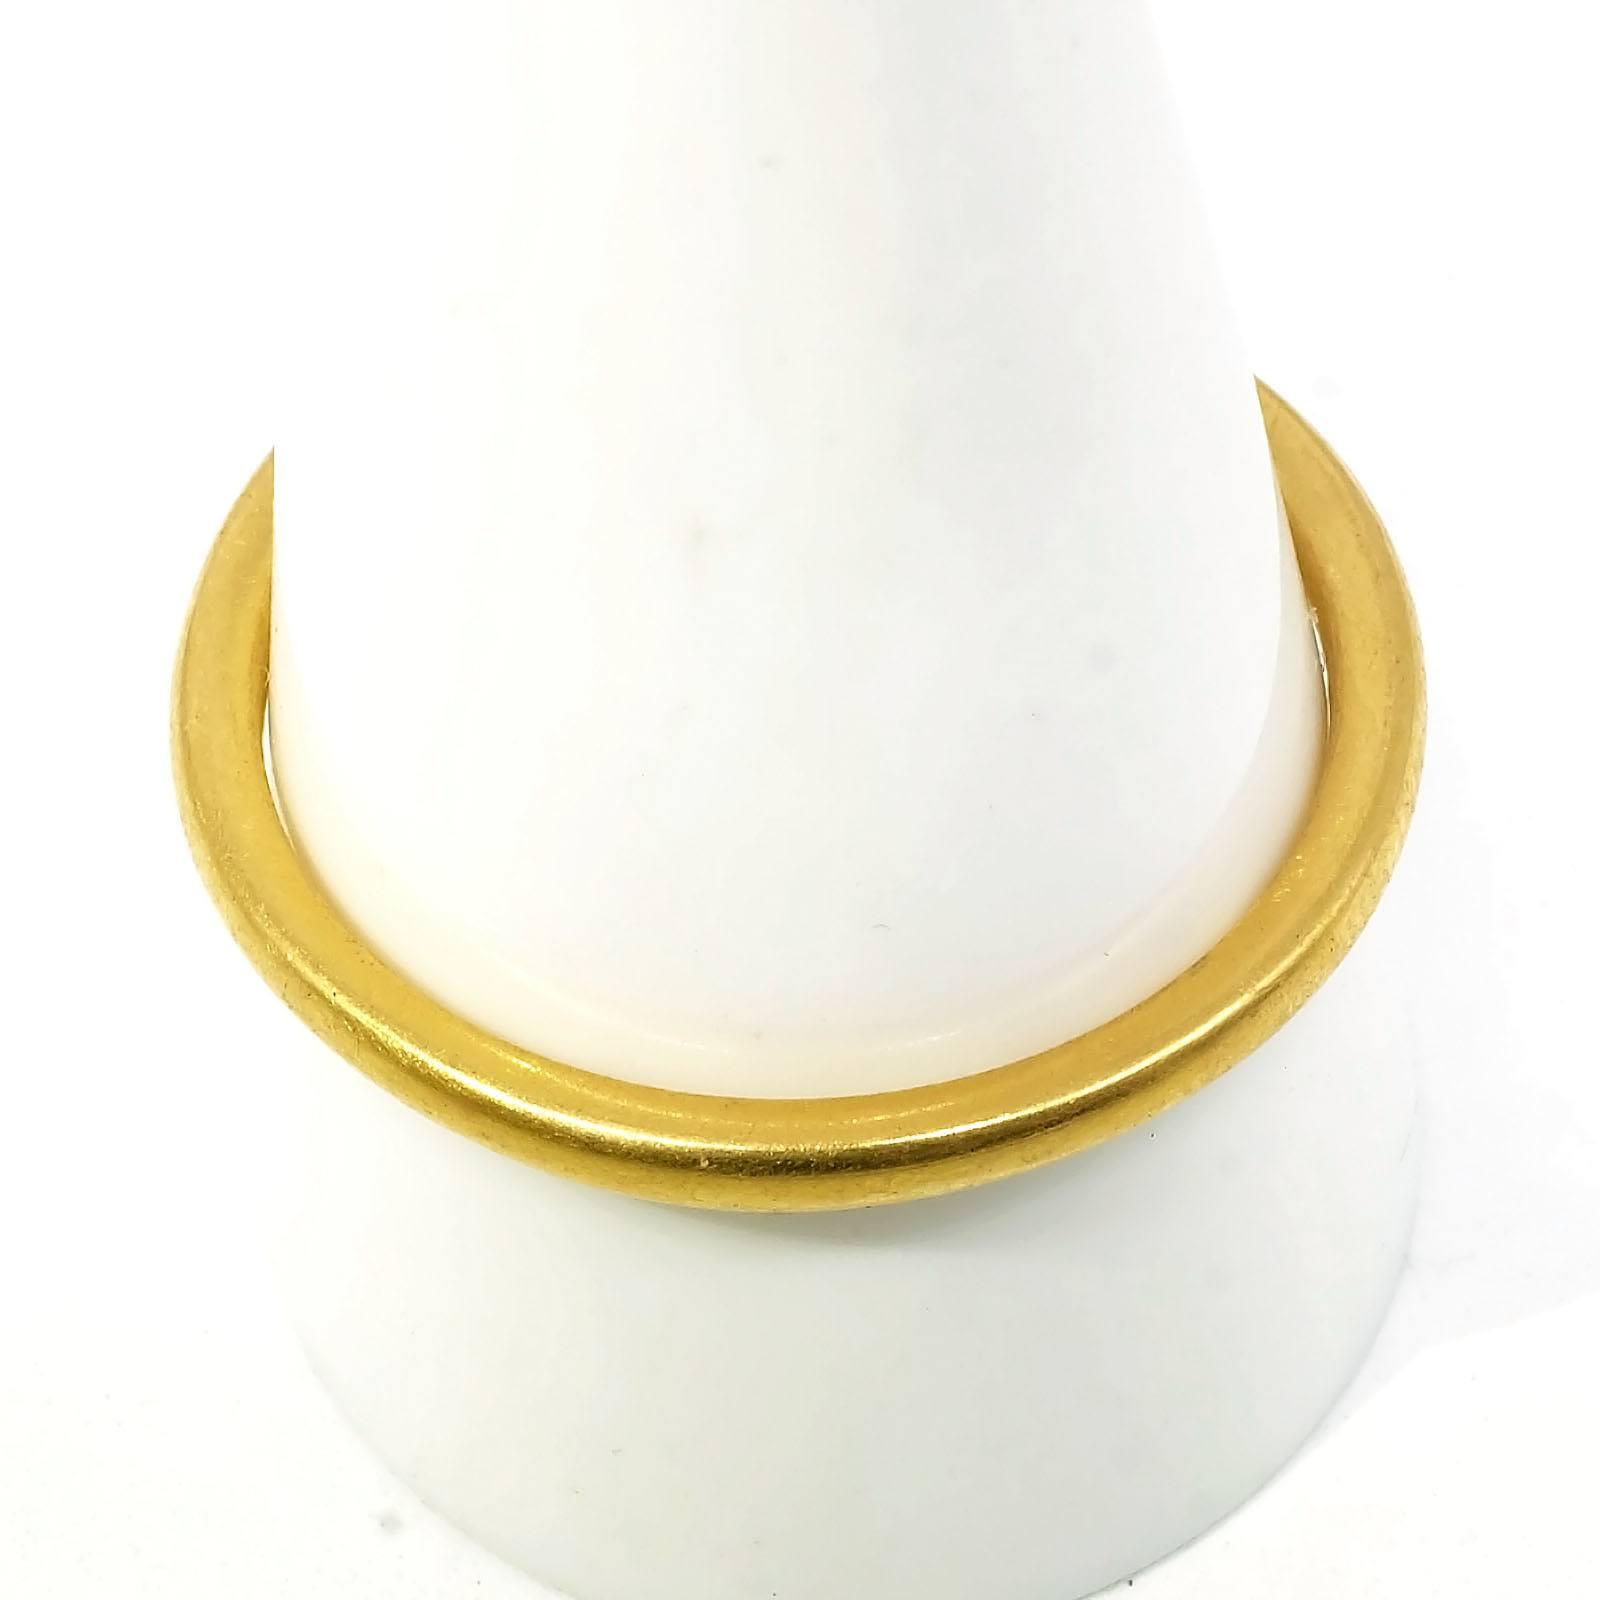 '22ct Yellow Gold Ring, 4.5g'